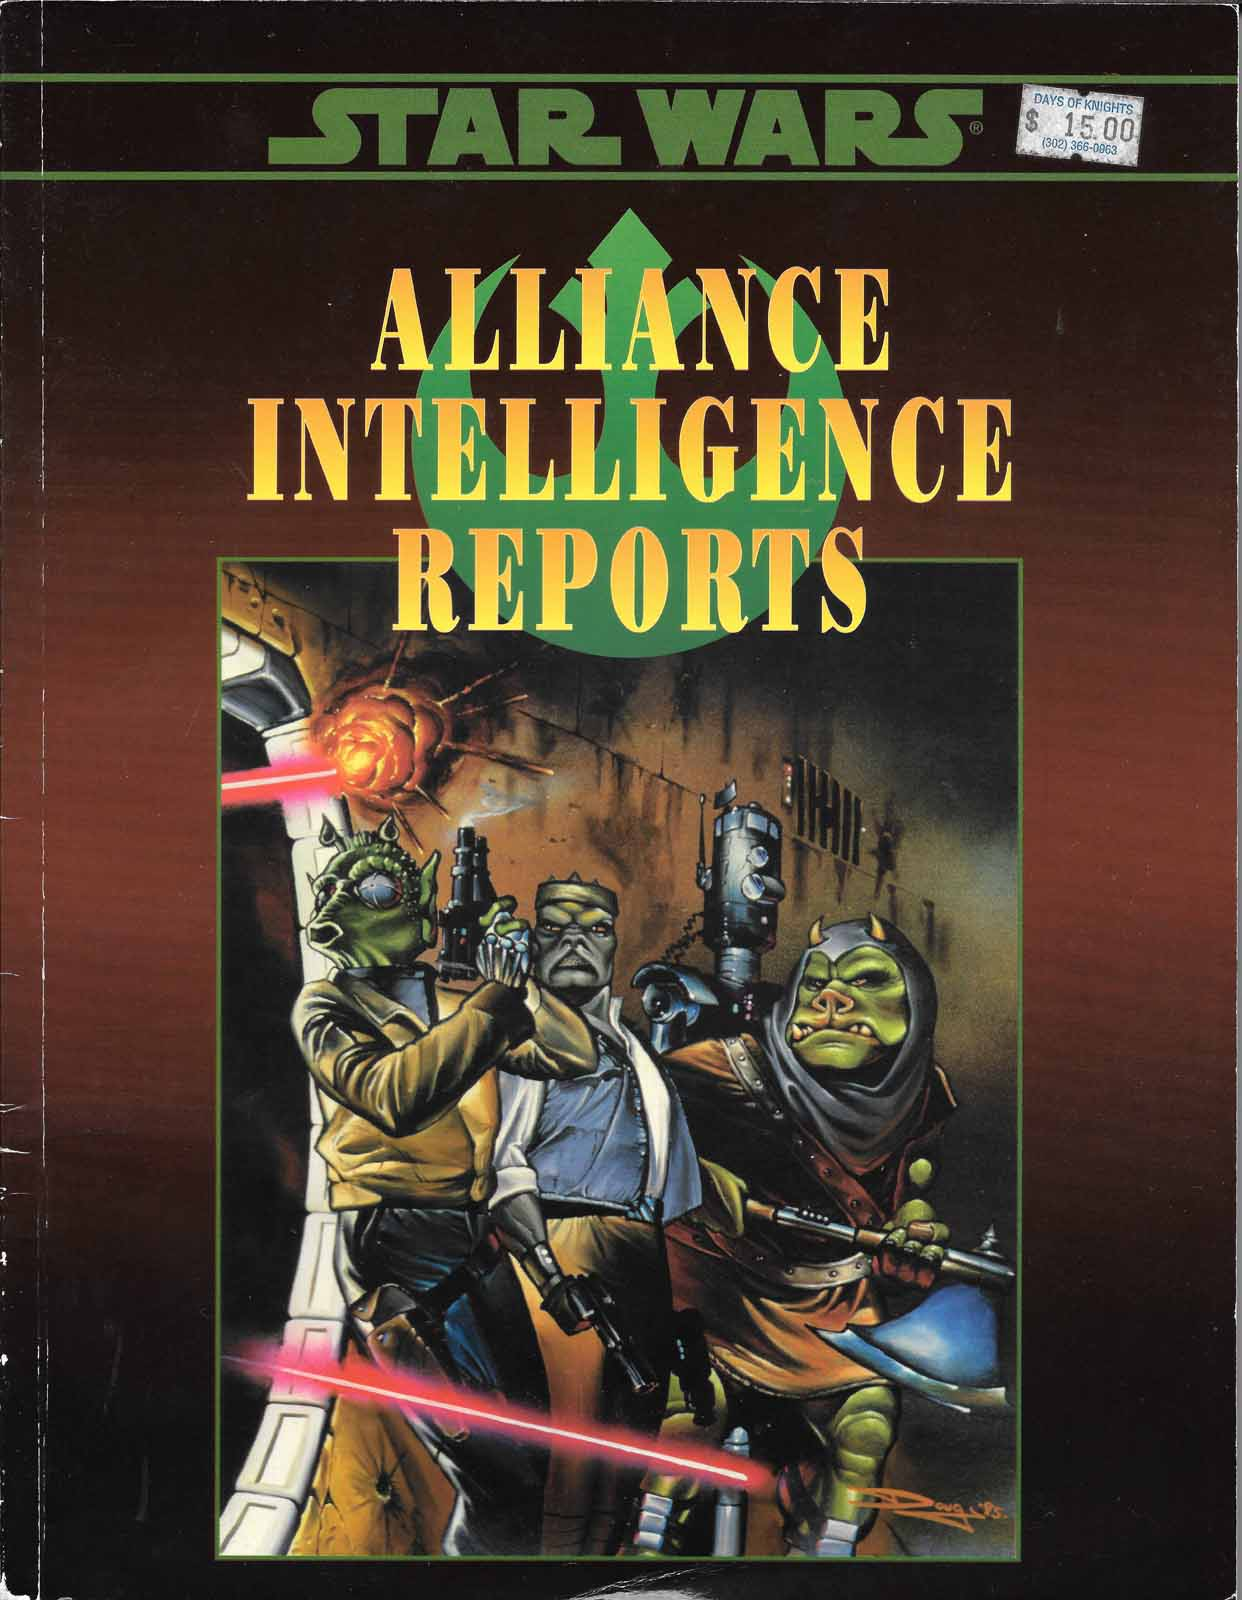 Star Wars RPG Alliance Intelligence Reports